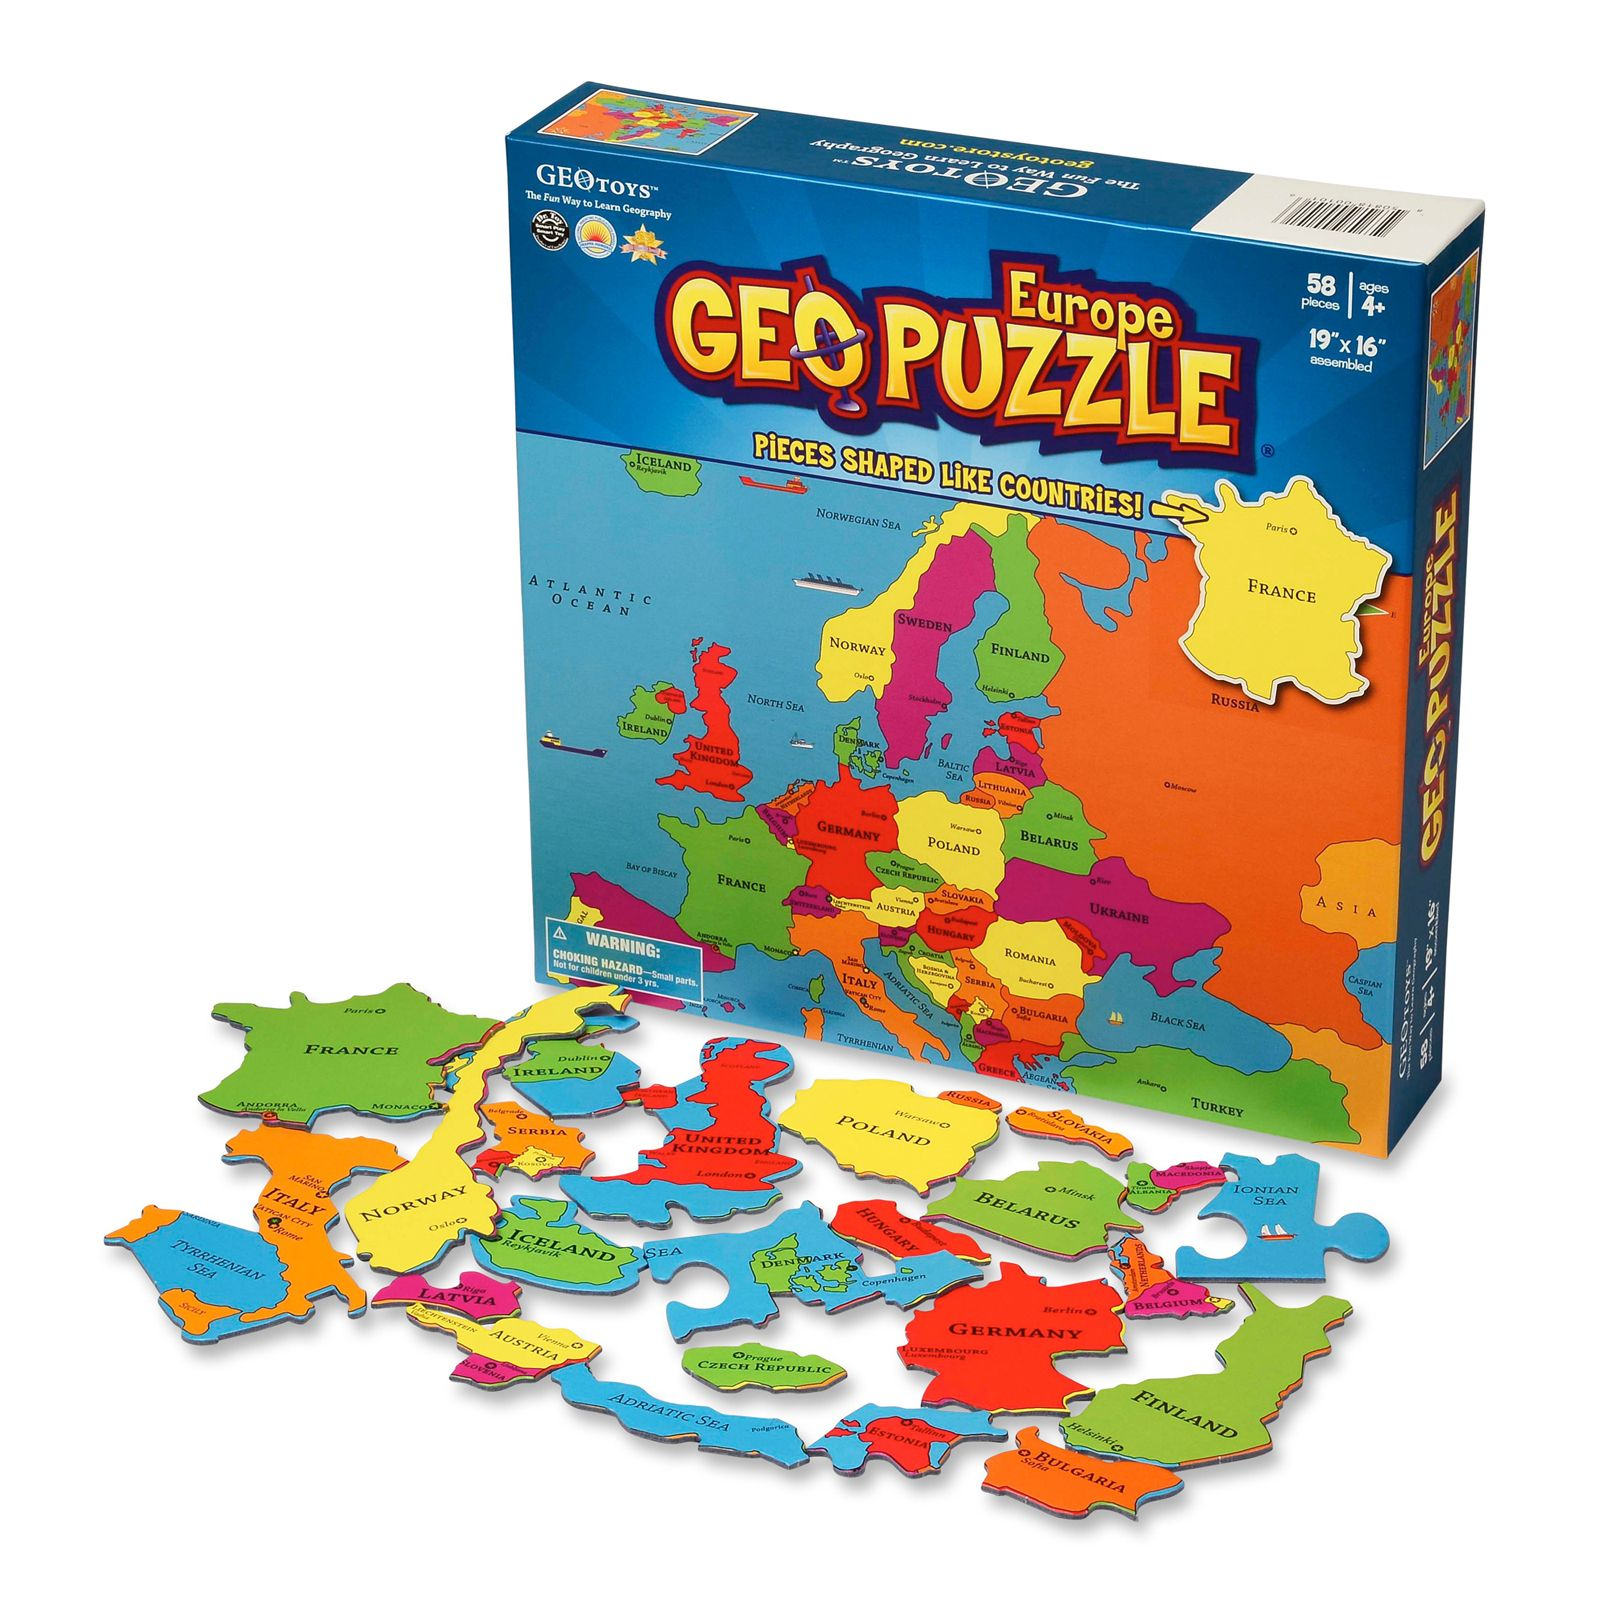 GEO TOYS GeoPuzzle Europe Jigsaw puzzles, World puzzle